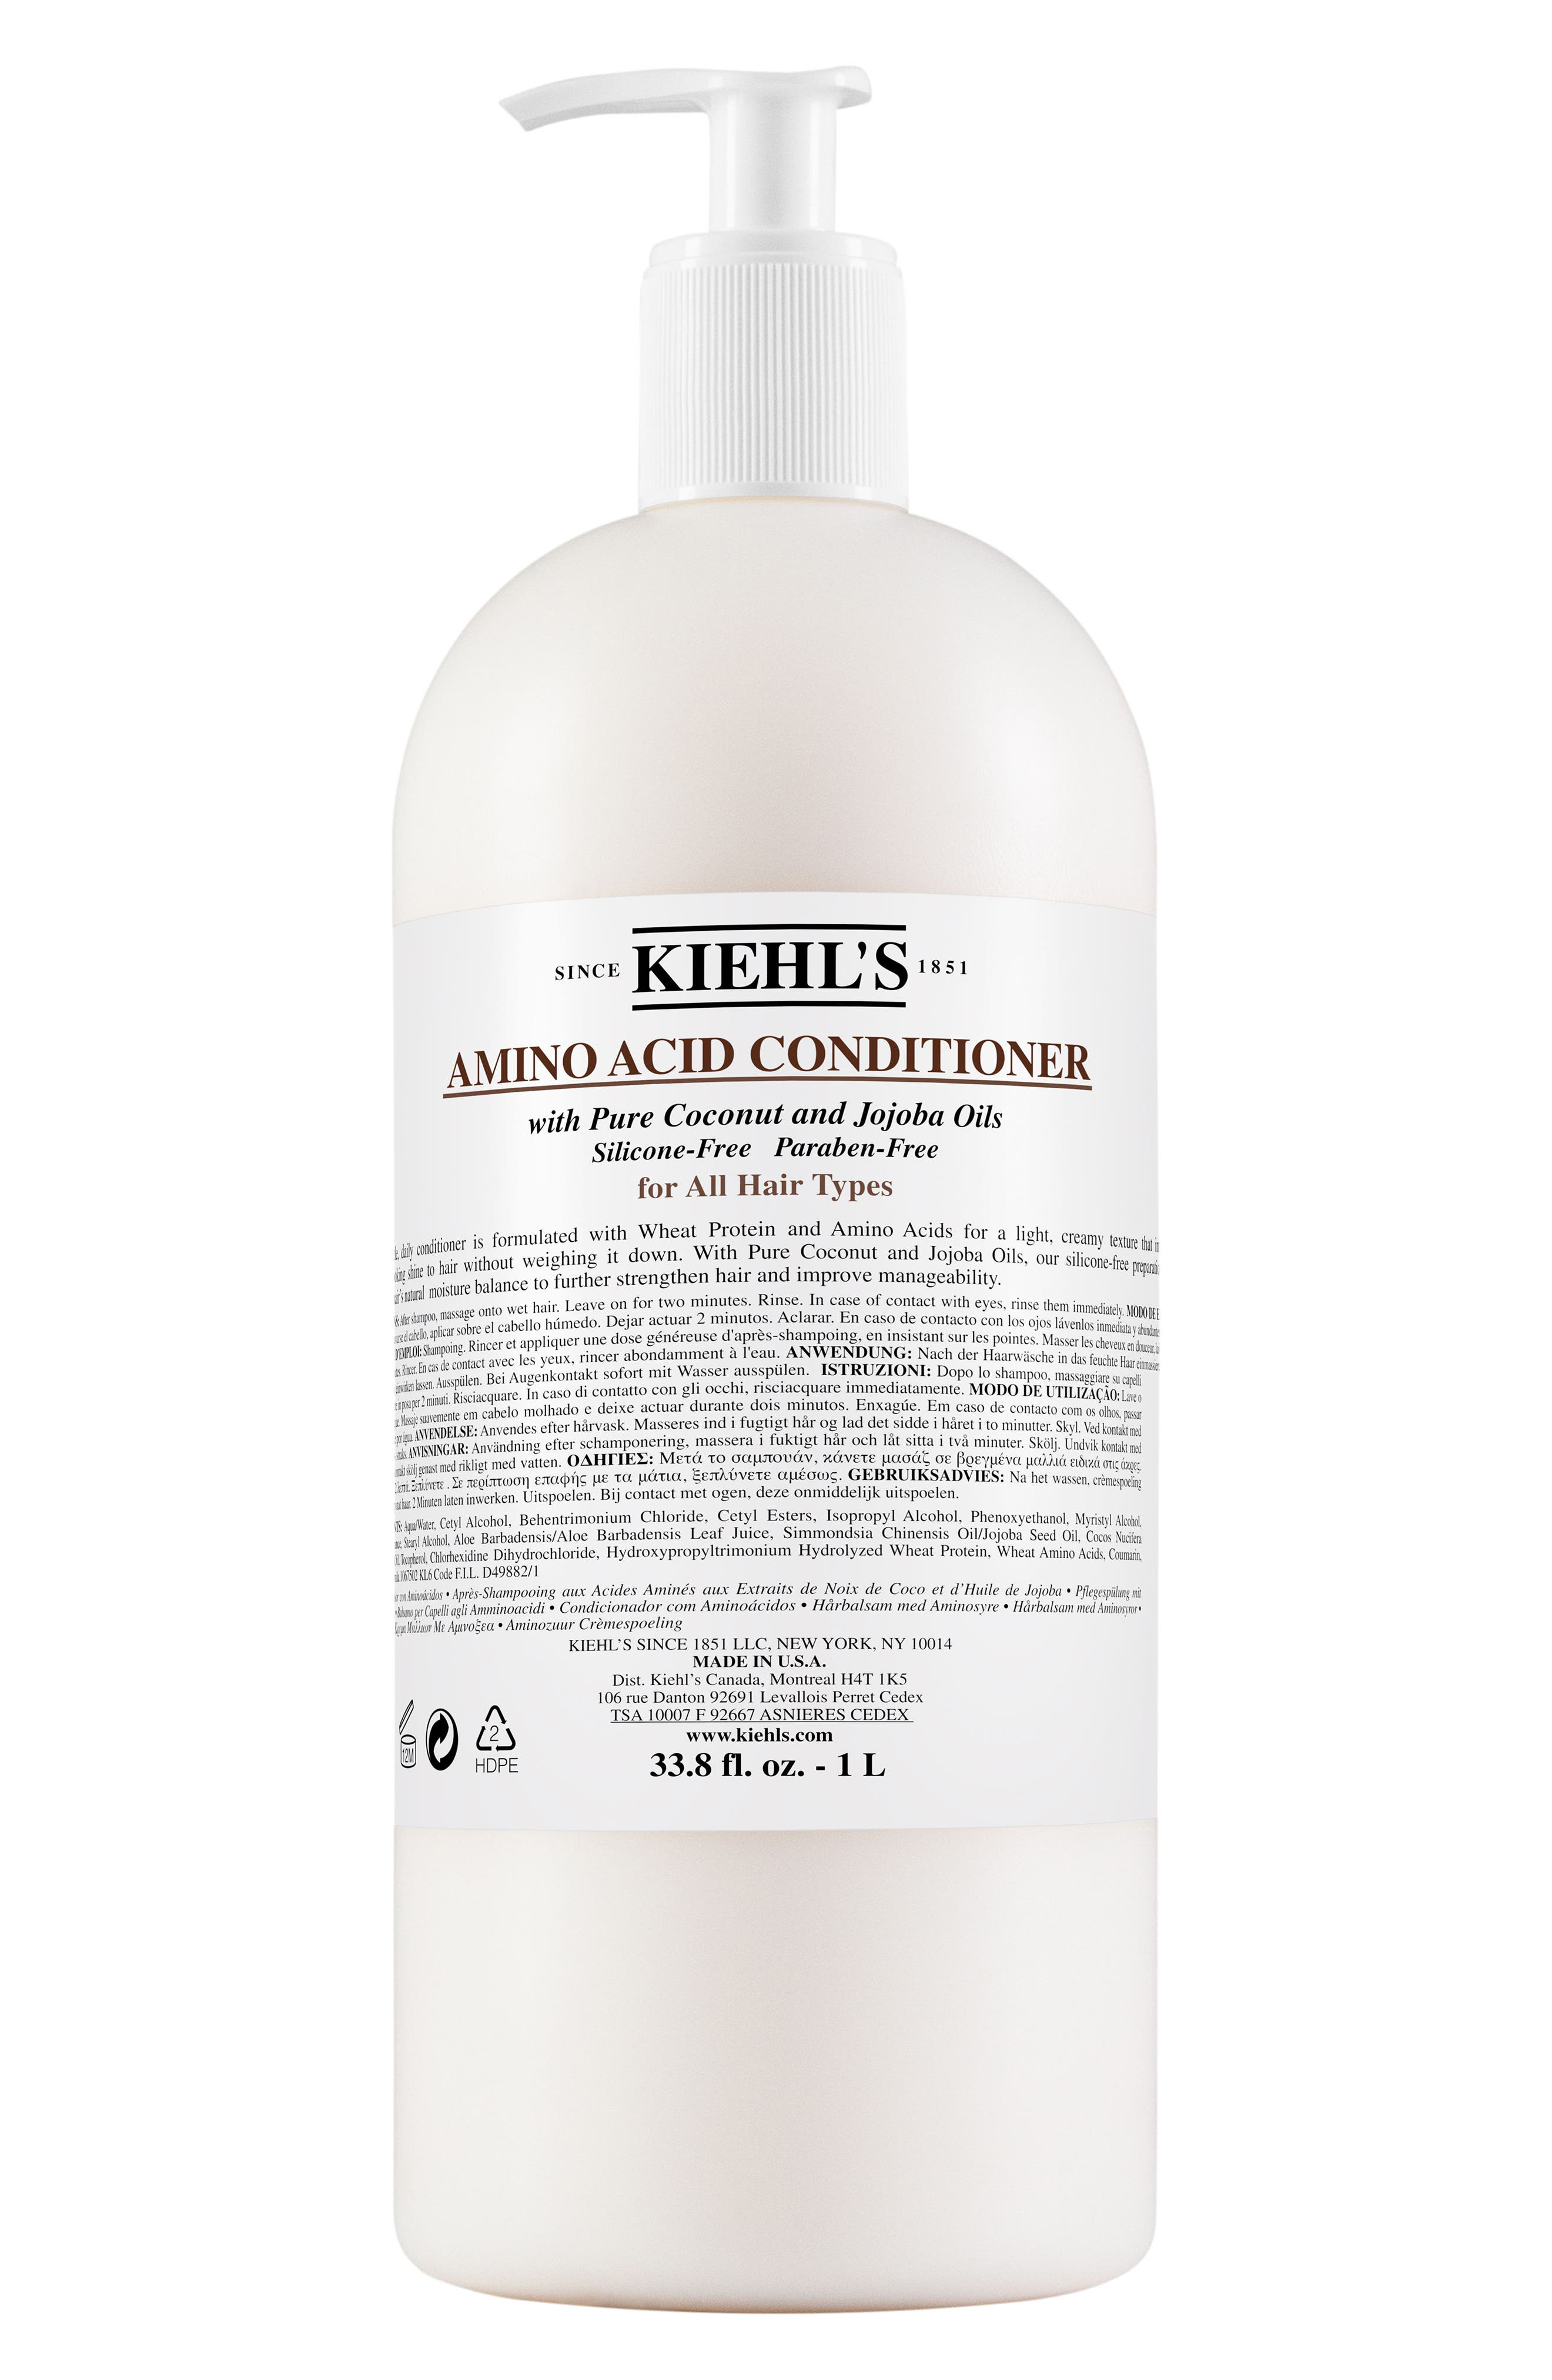 Kiehl's Since 1851 Jumbo Amino Acid Conditioner ($60 Value)